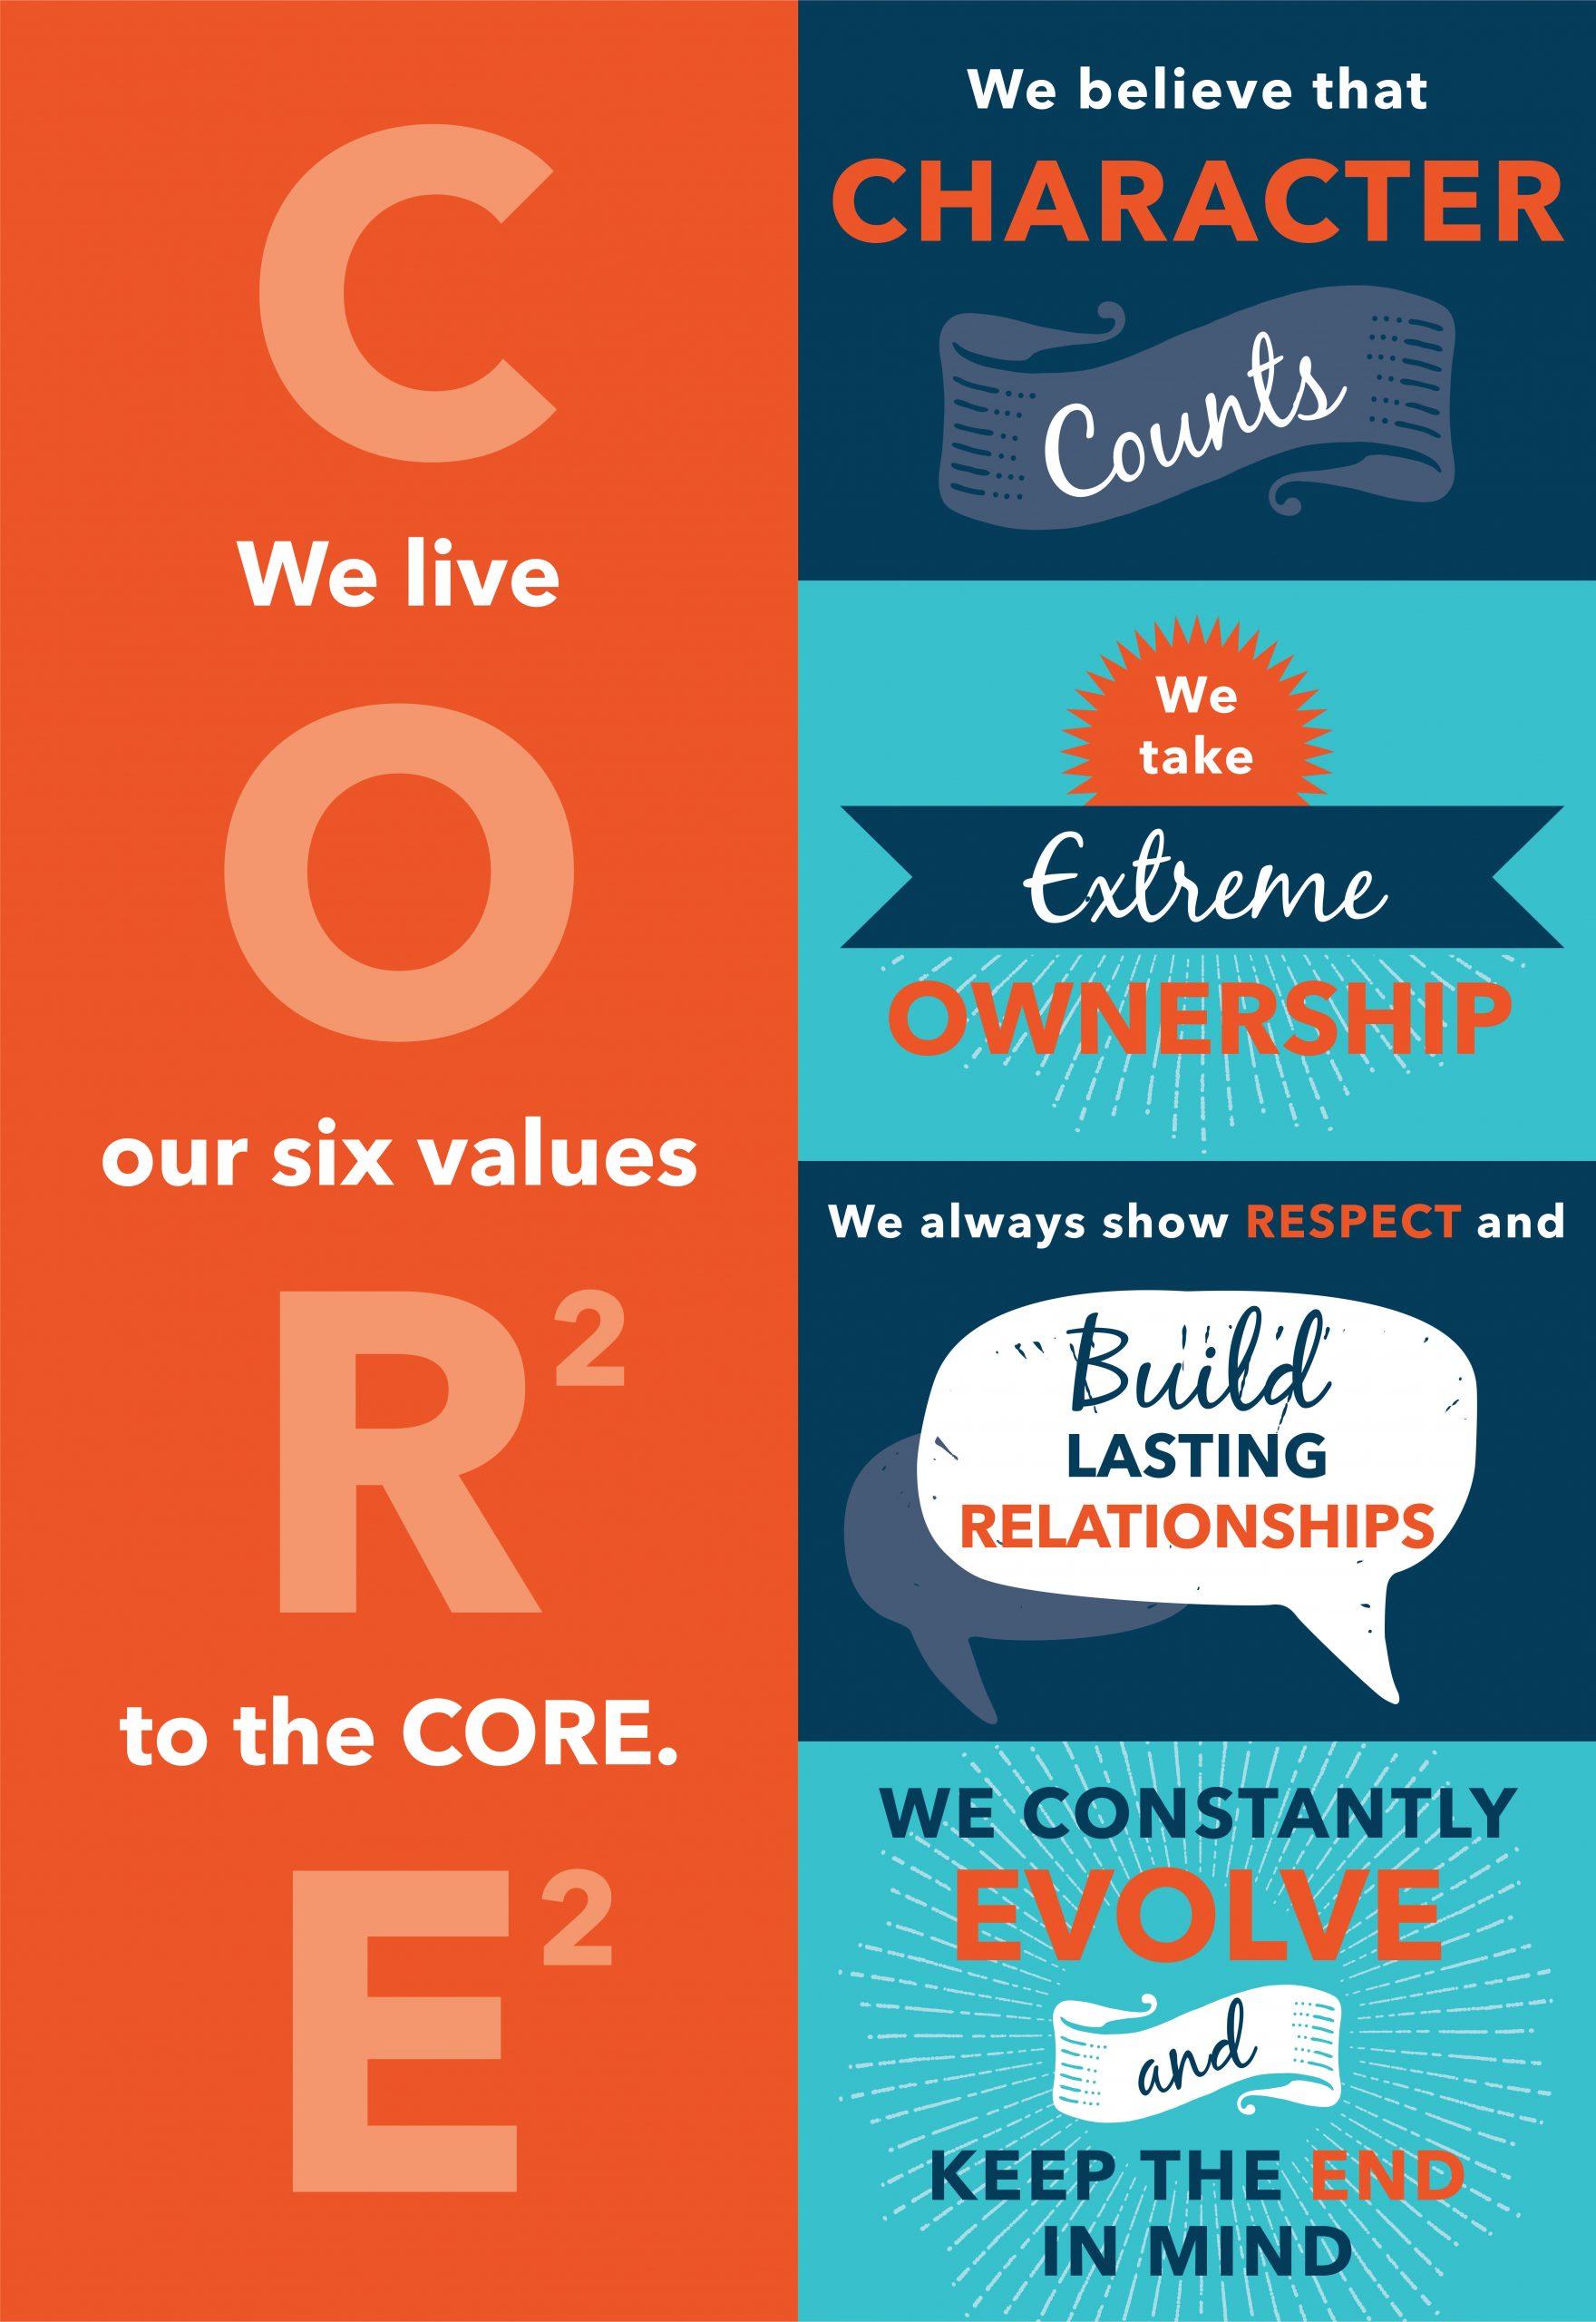 CrestCore_CORE_Values_Poster_Web